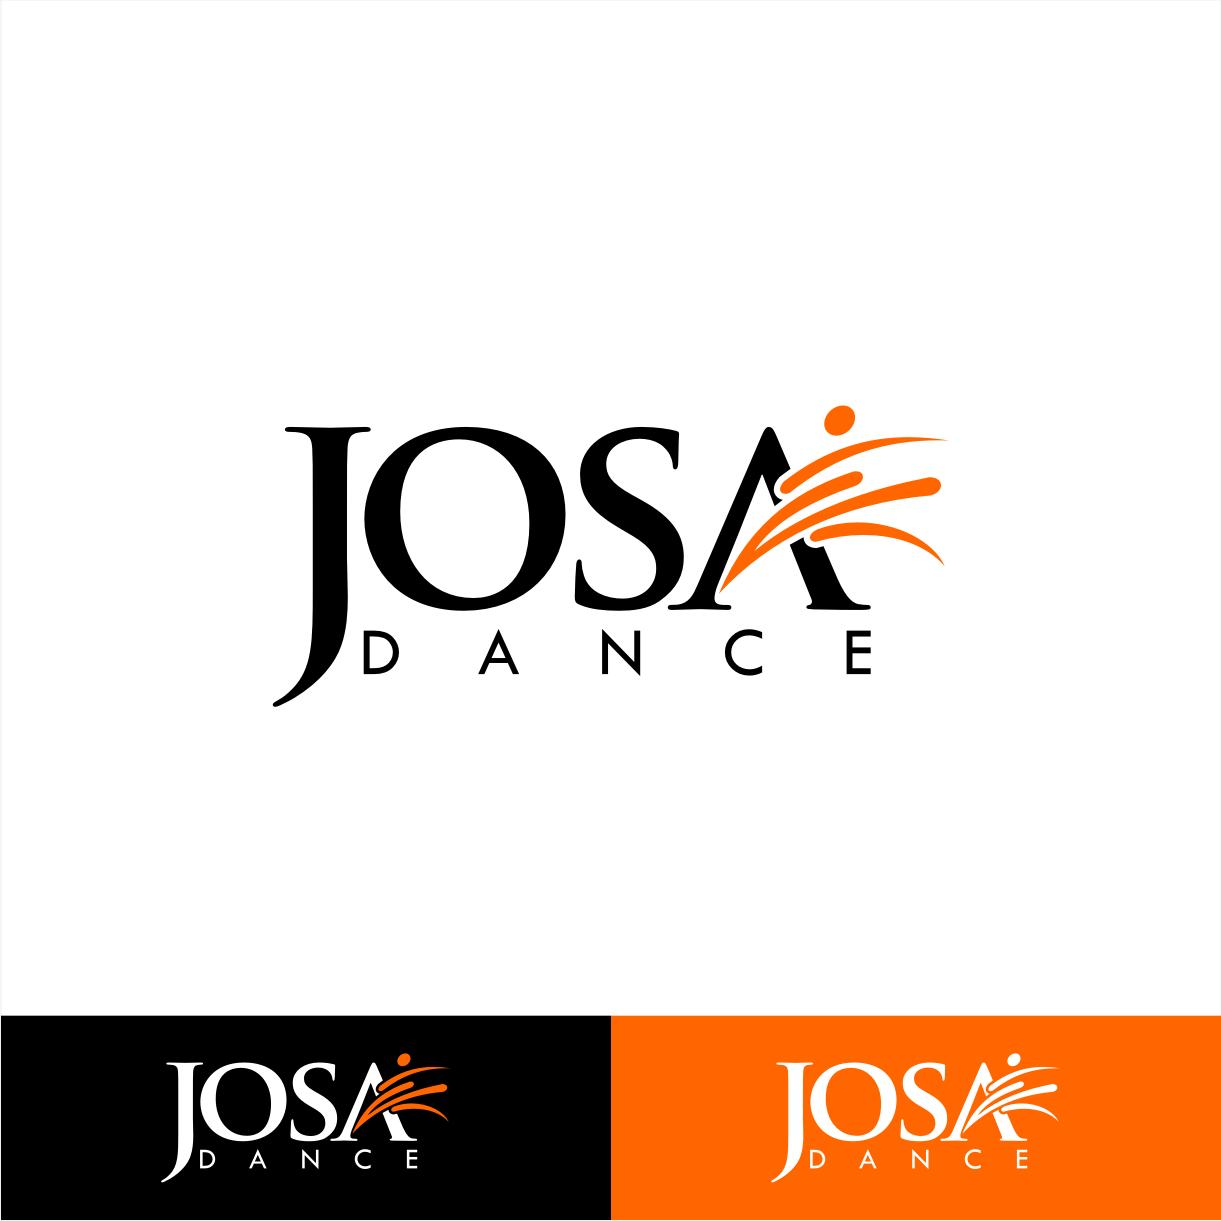 Design a logo for a new Dance Shoe company